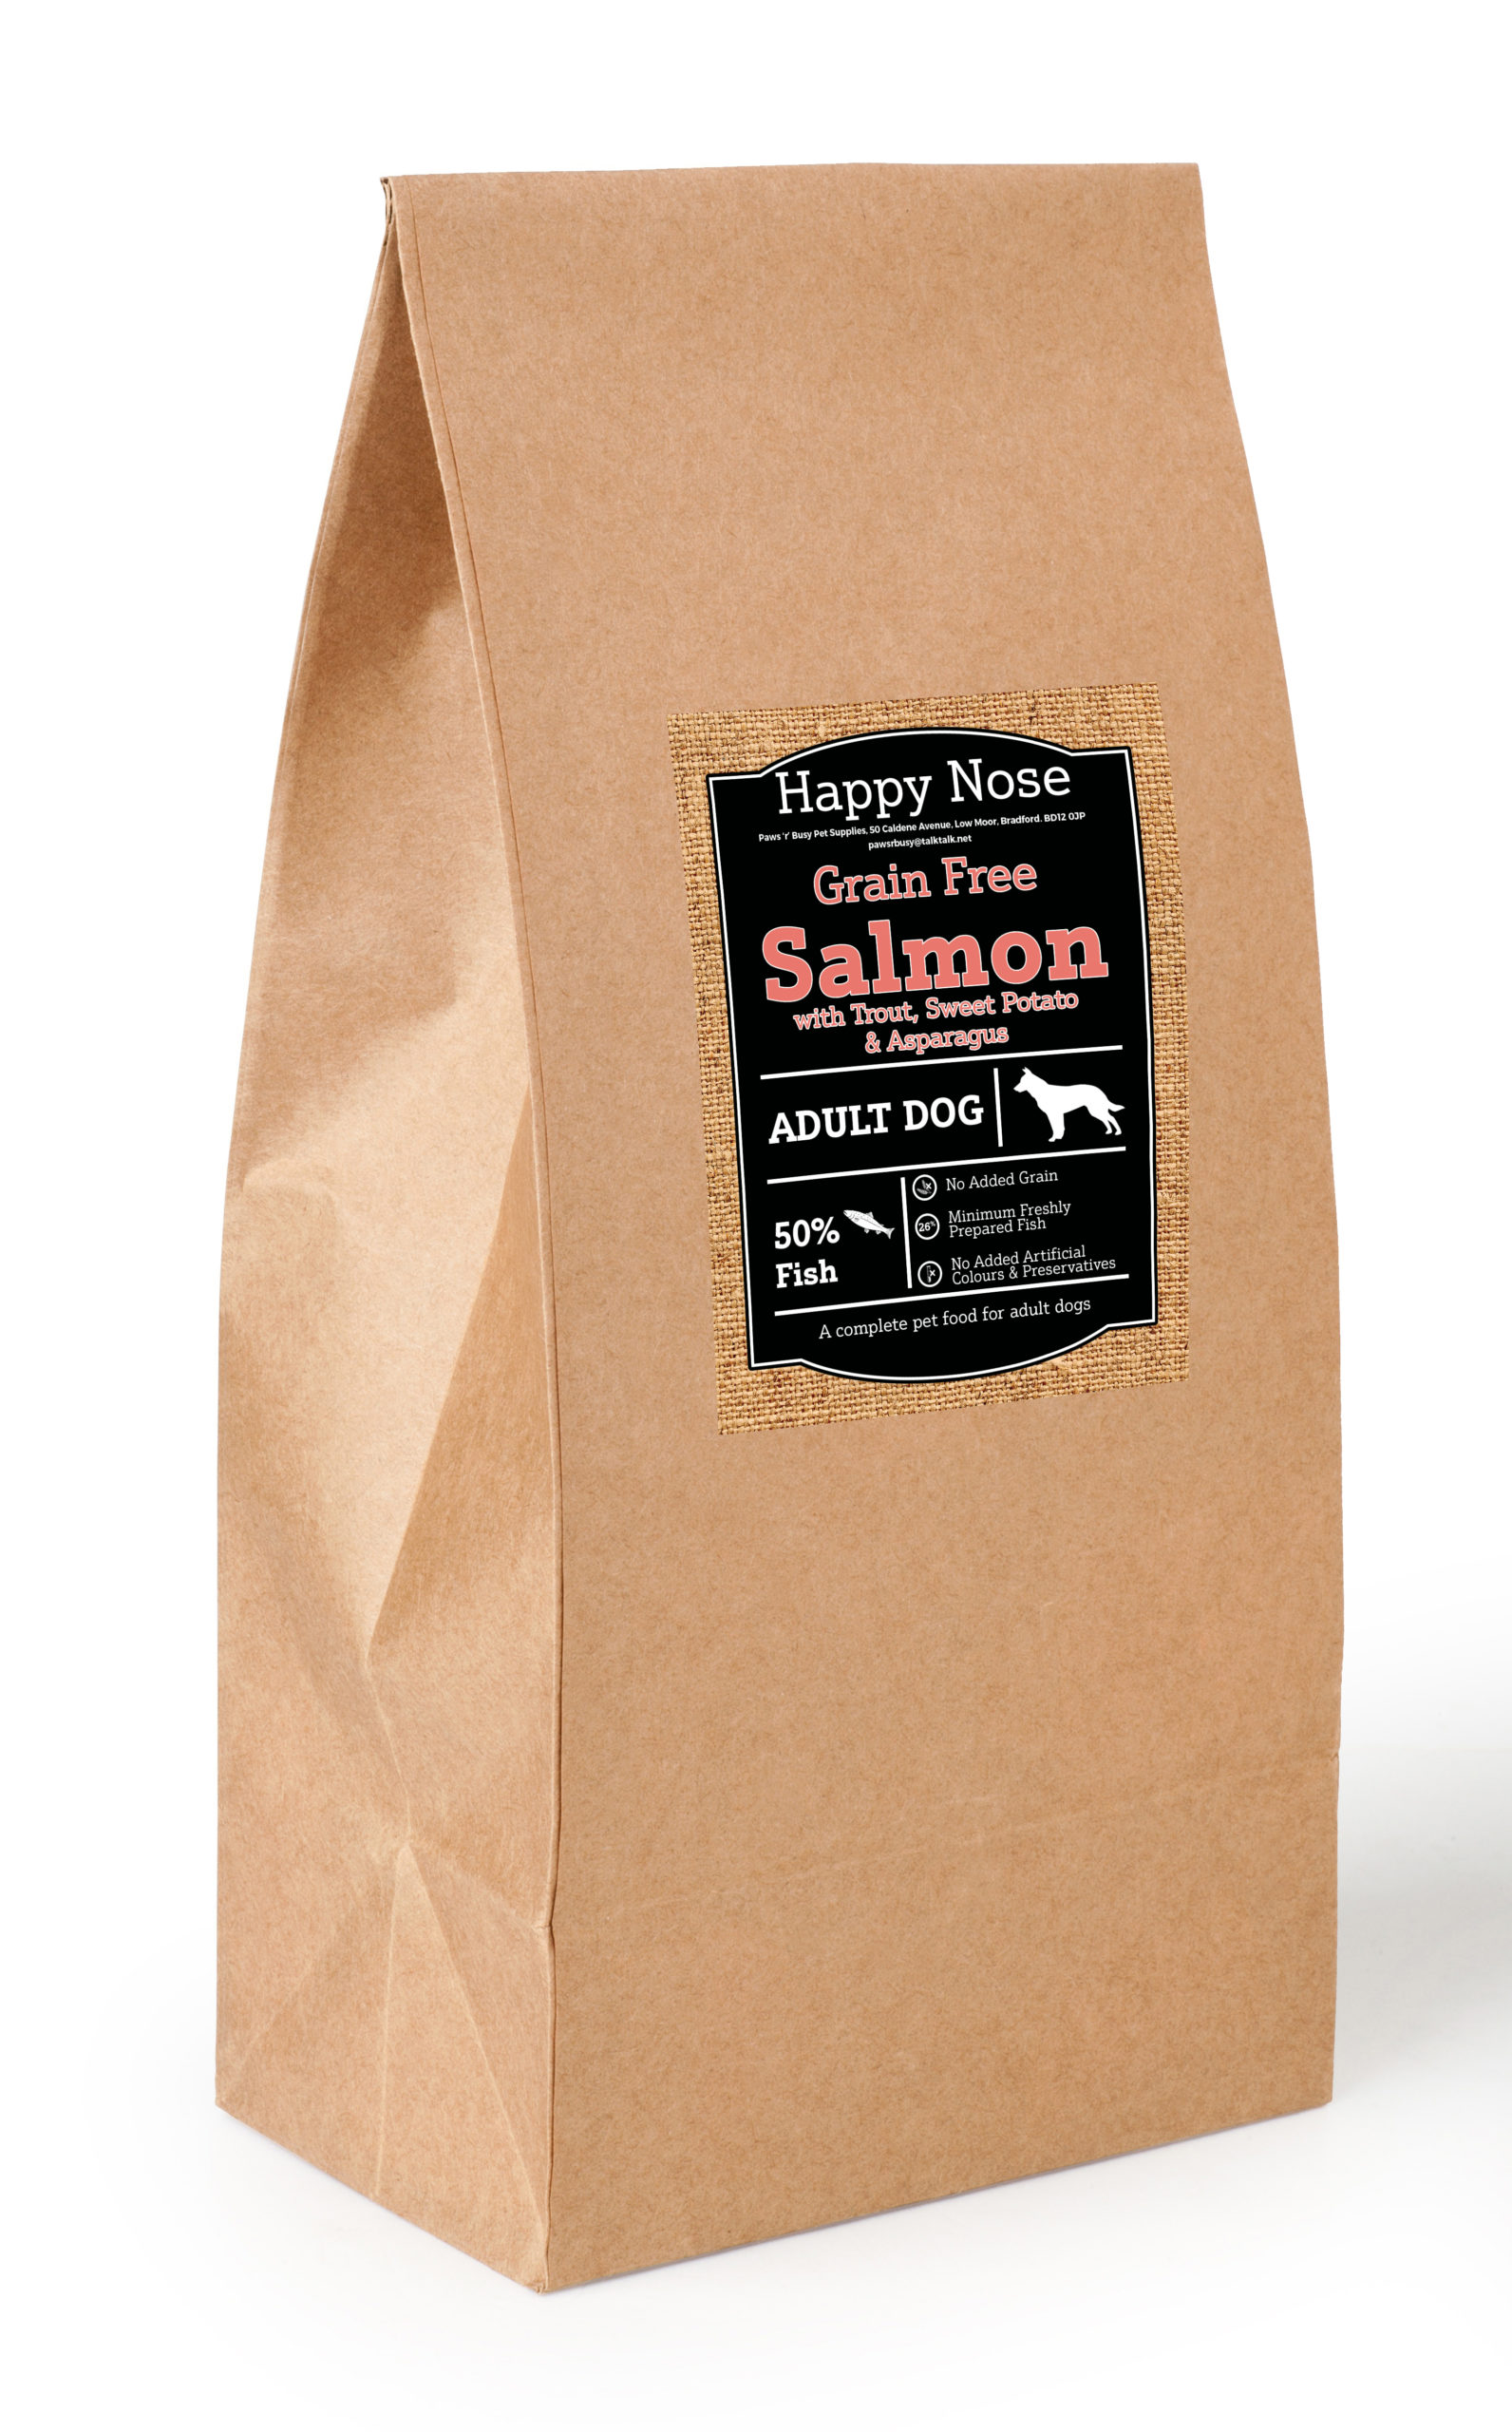 Salmon, Trout, Sweet Potato & Asparagus Adult Dog Food